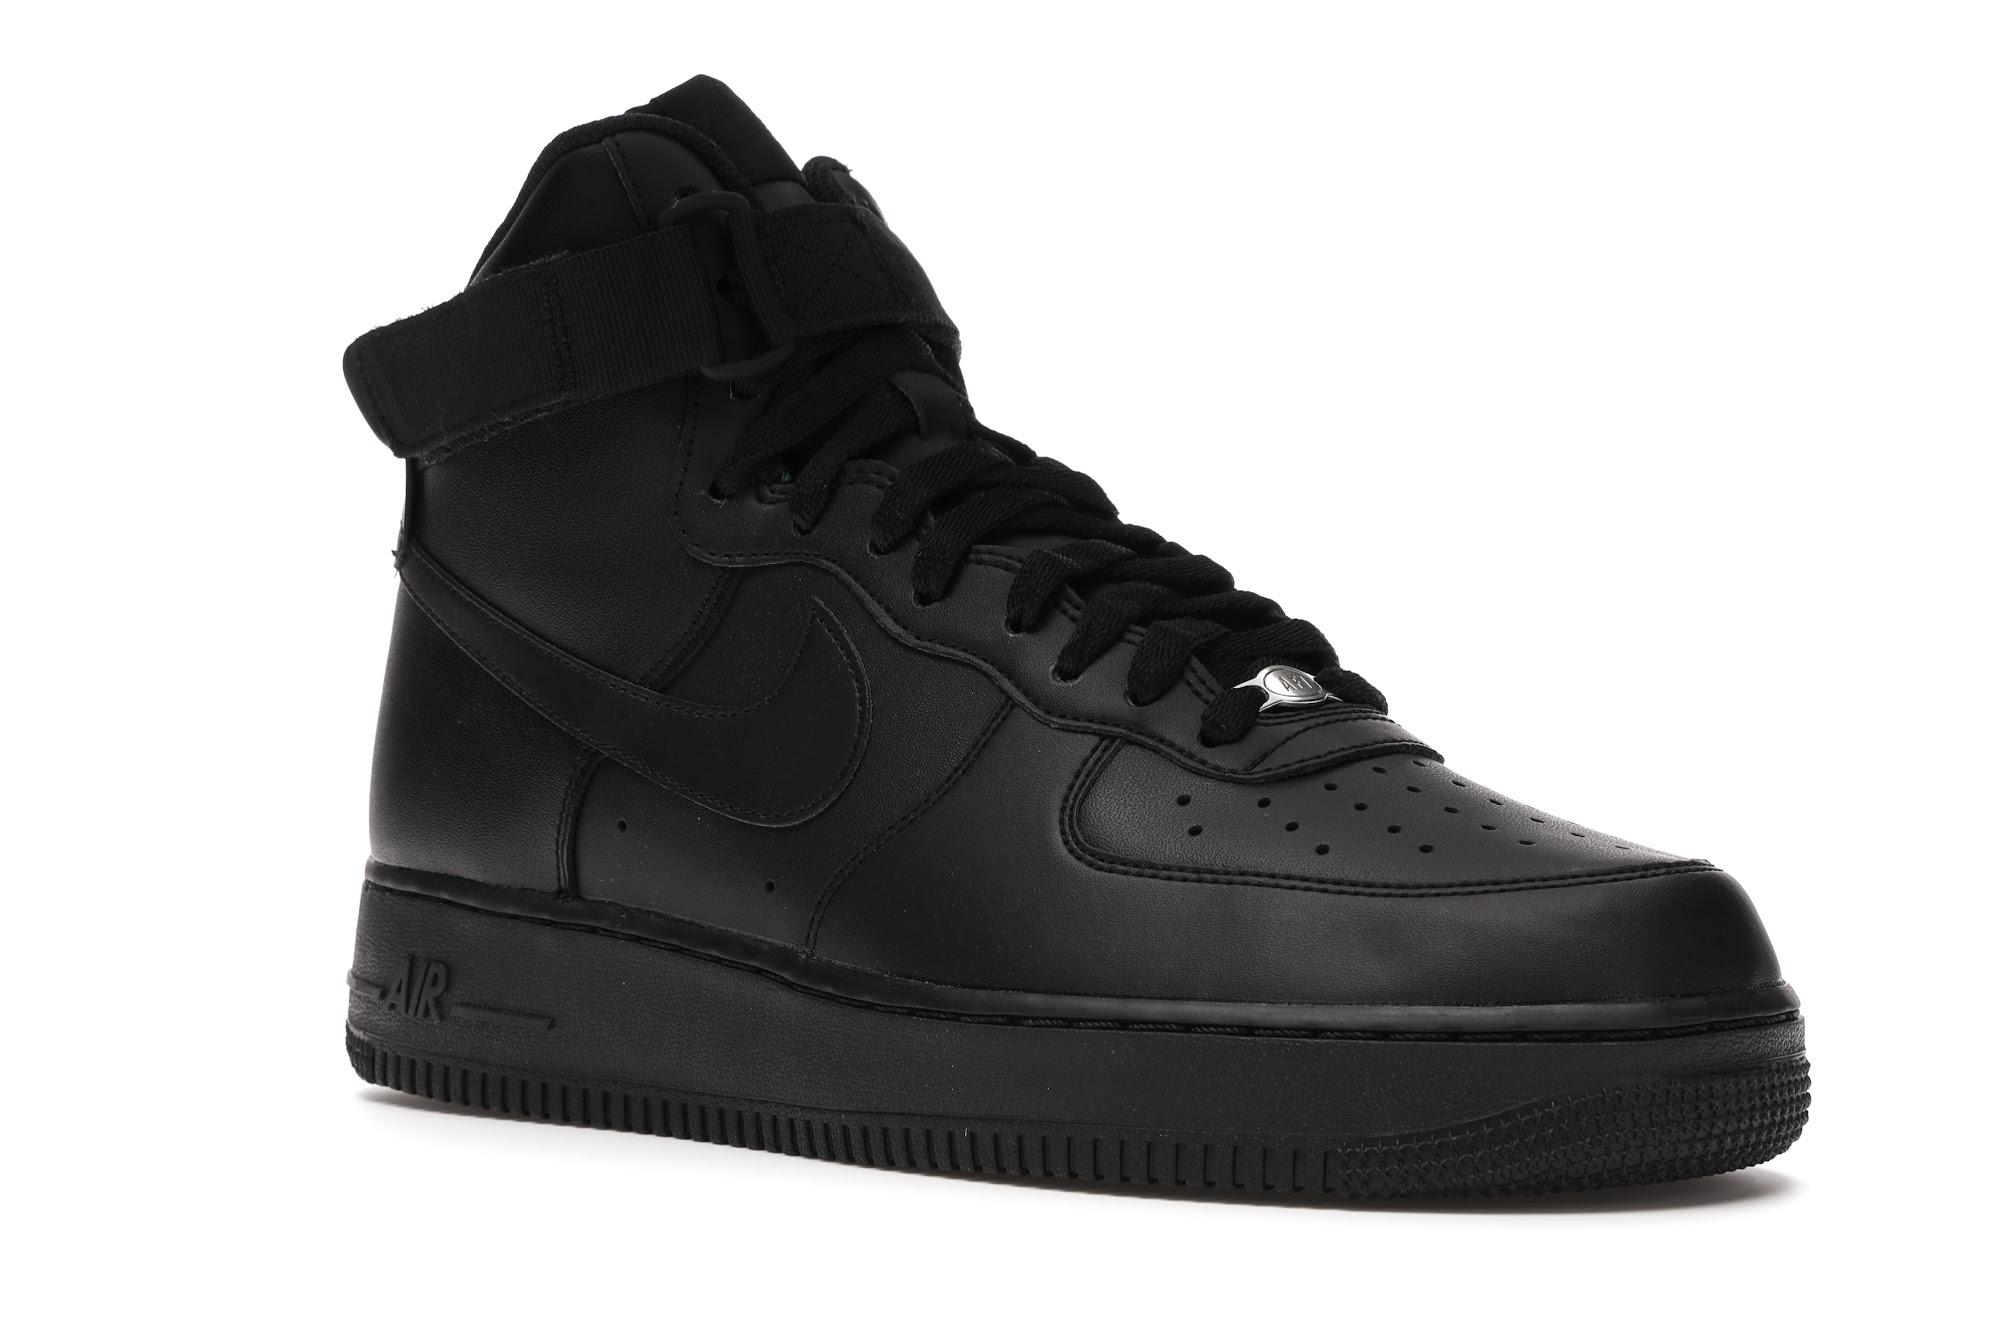 Nike Air Force 1 High Triple Black (2017) - 315121-032